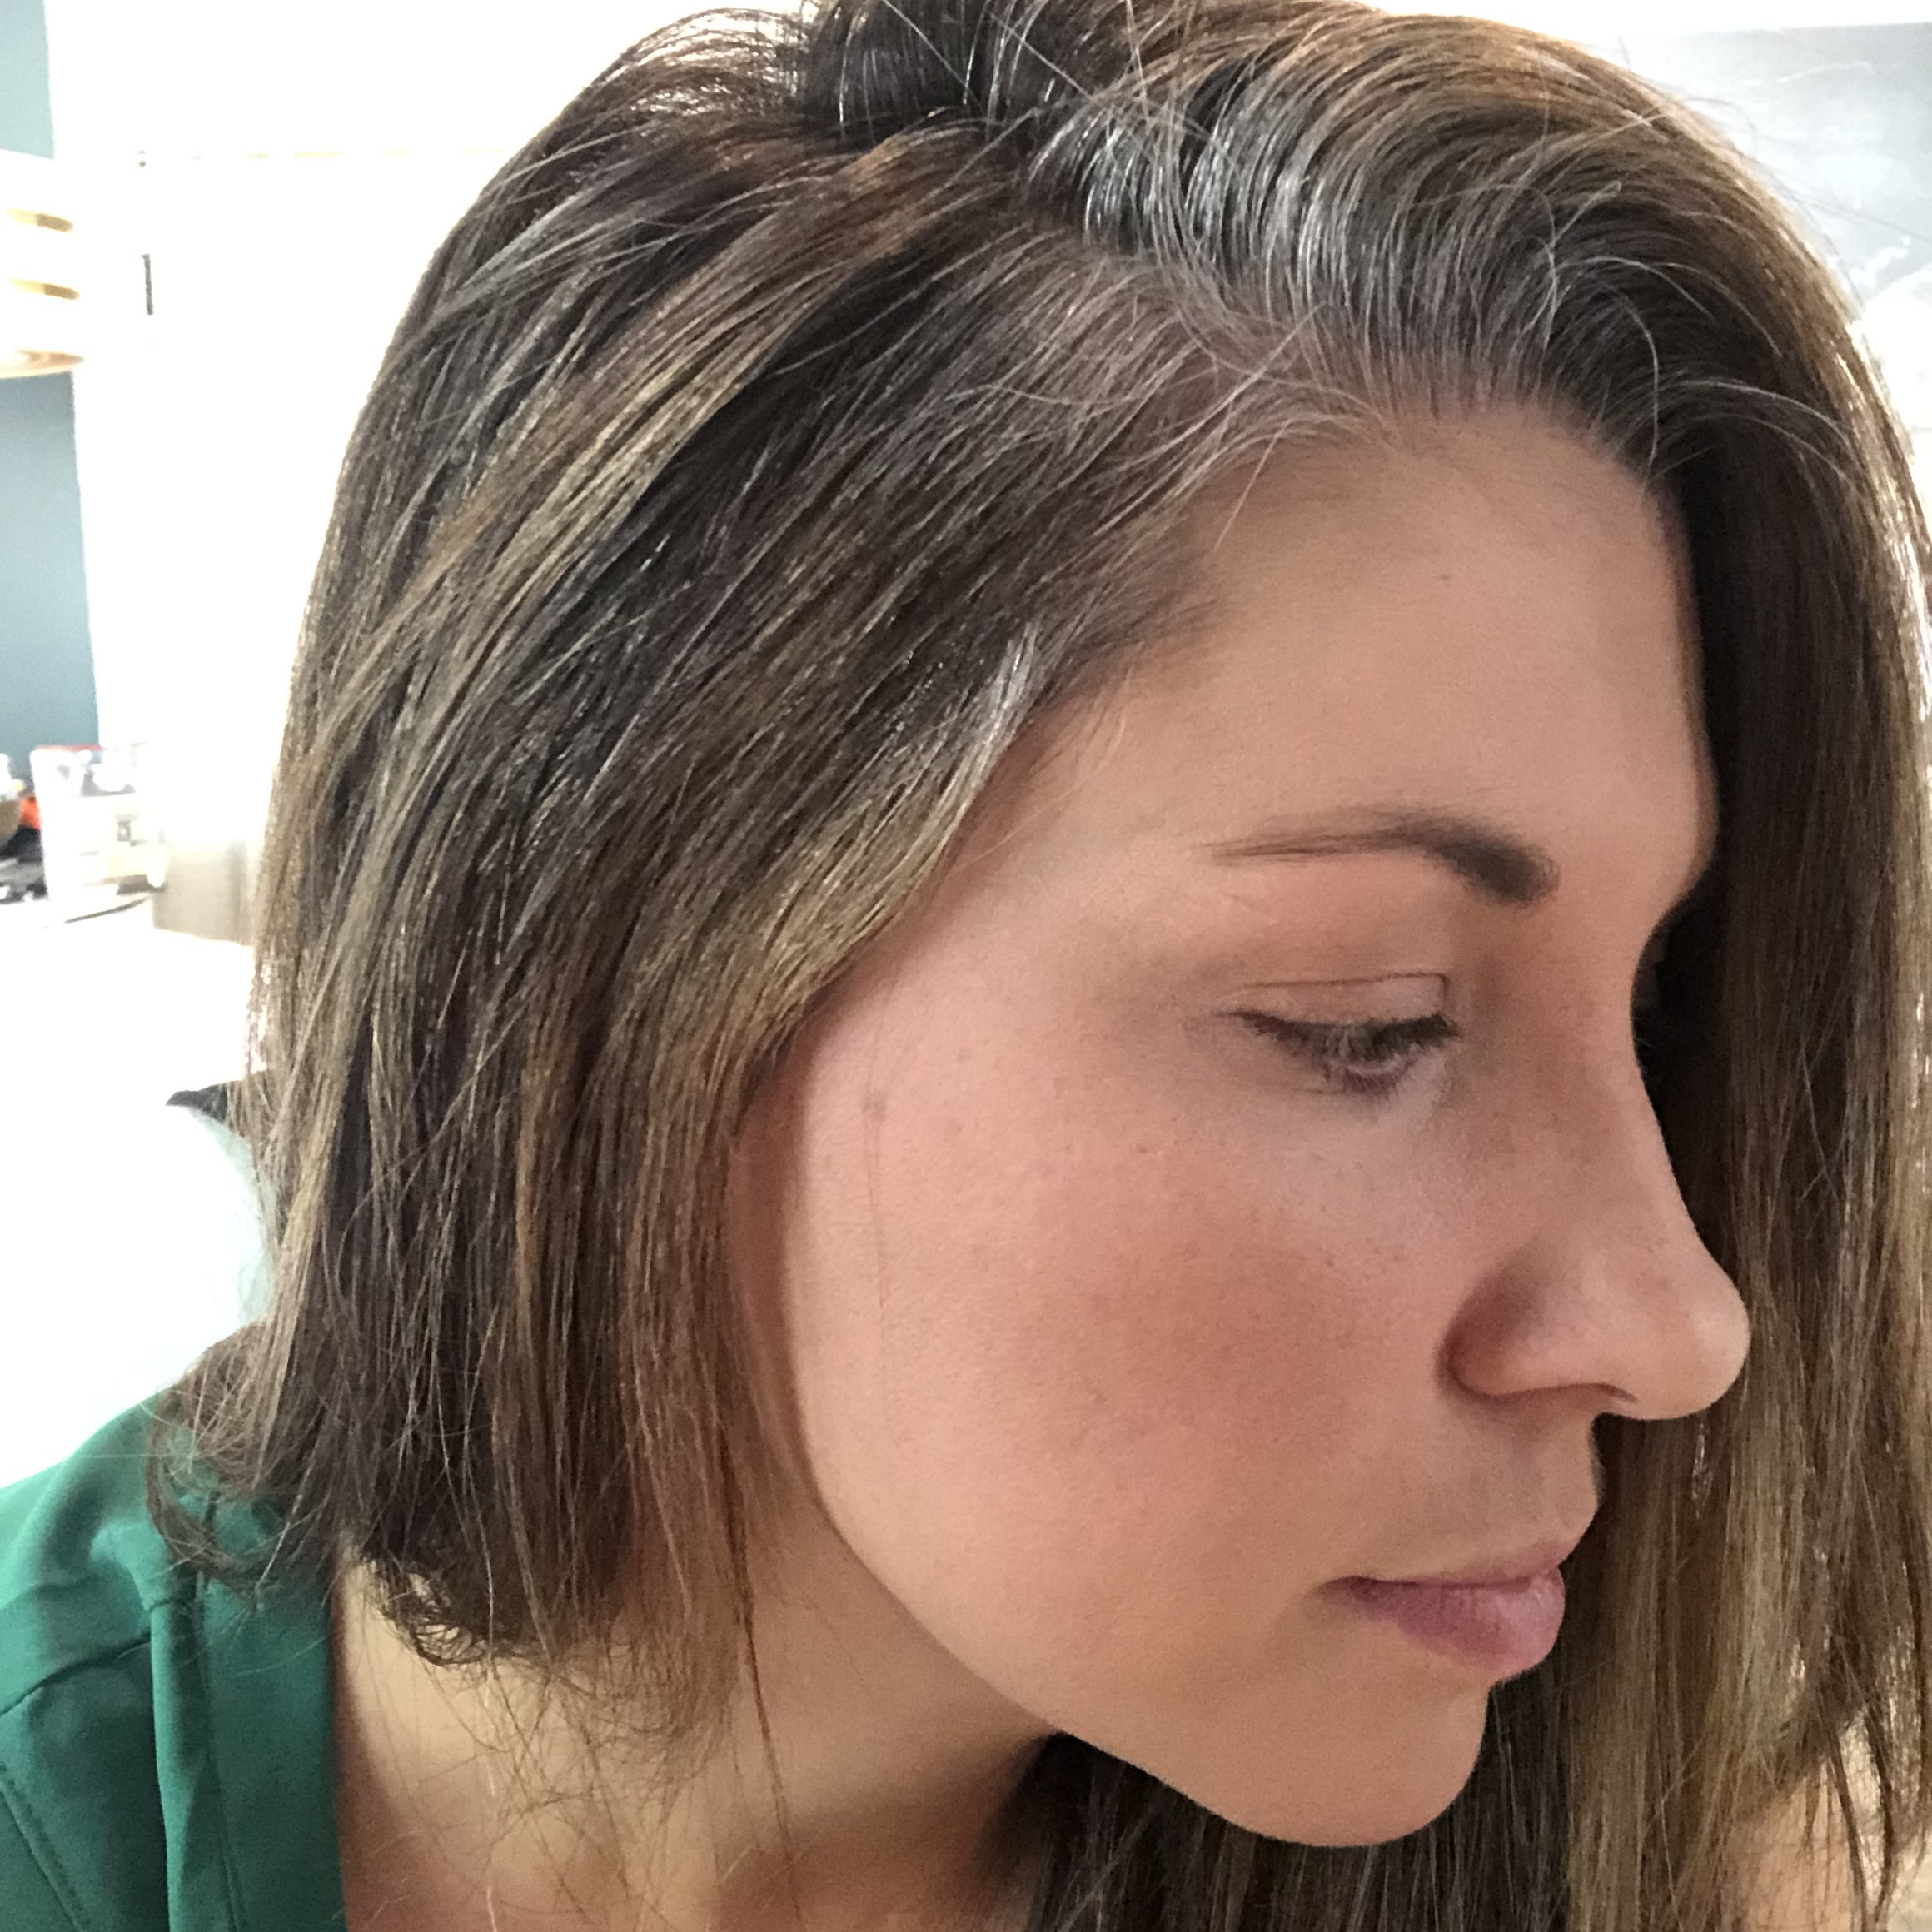 Mom letting hair go gray